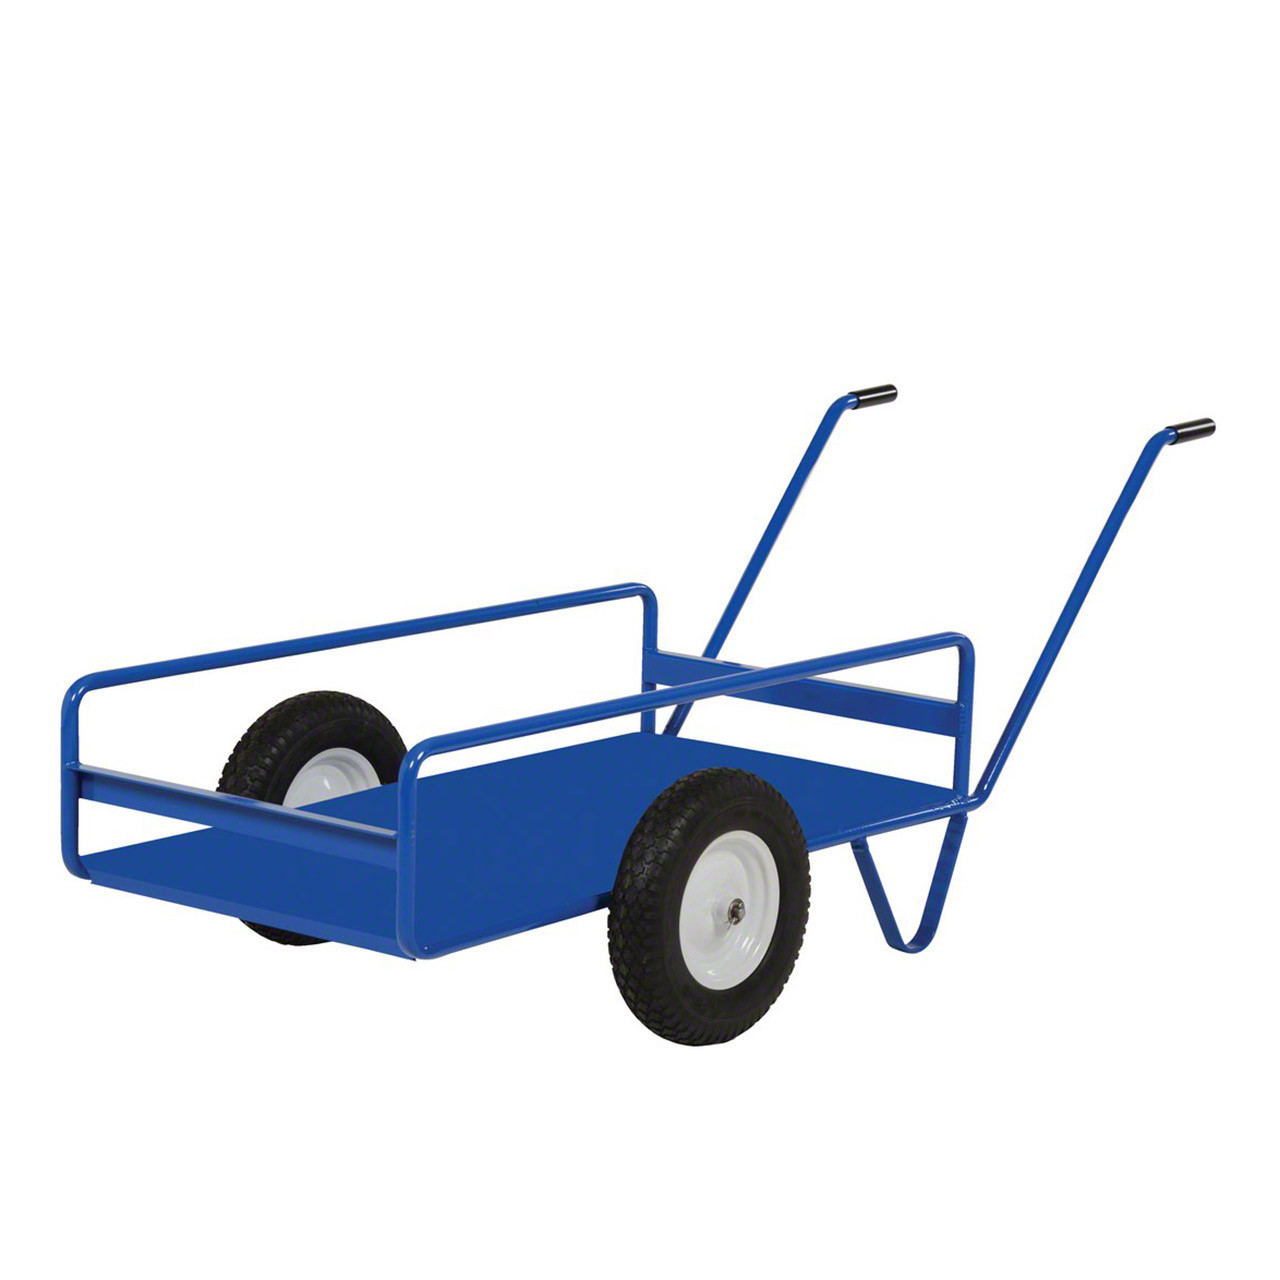 Vestil's tilting work truck with solid steel deck